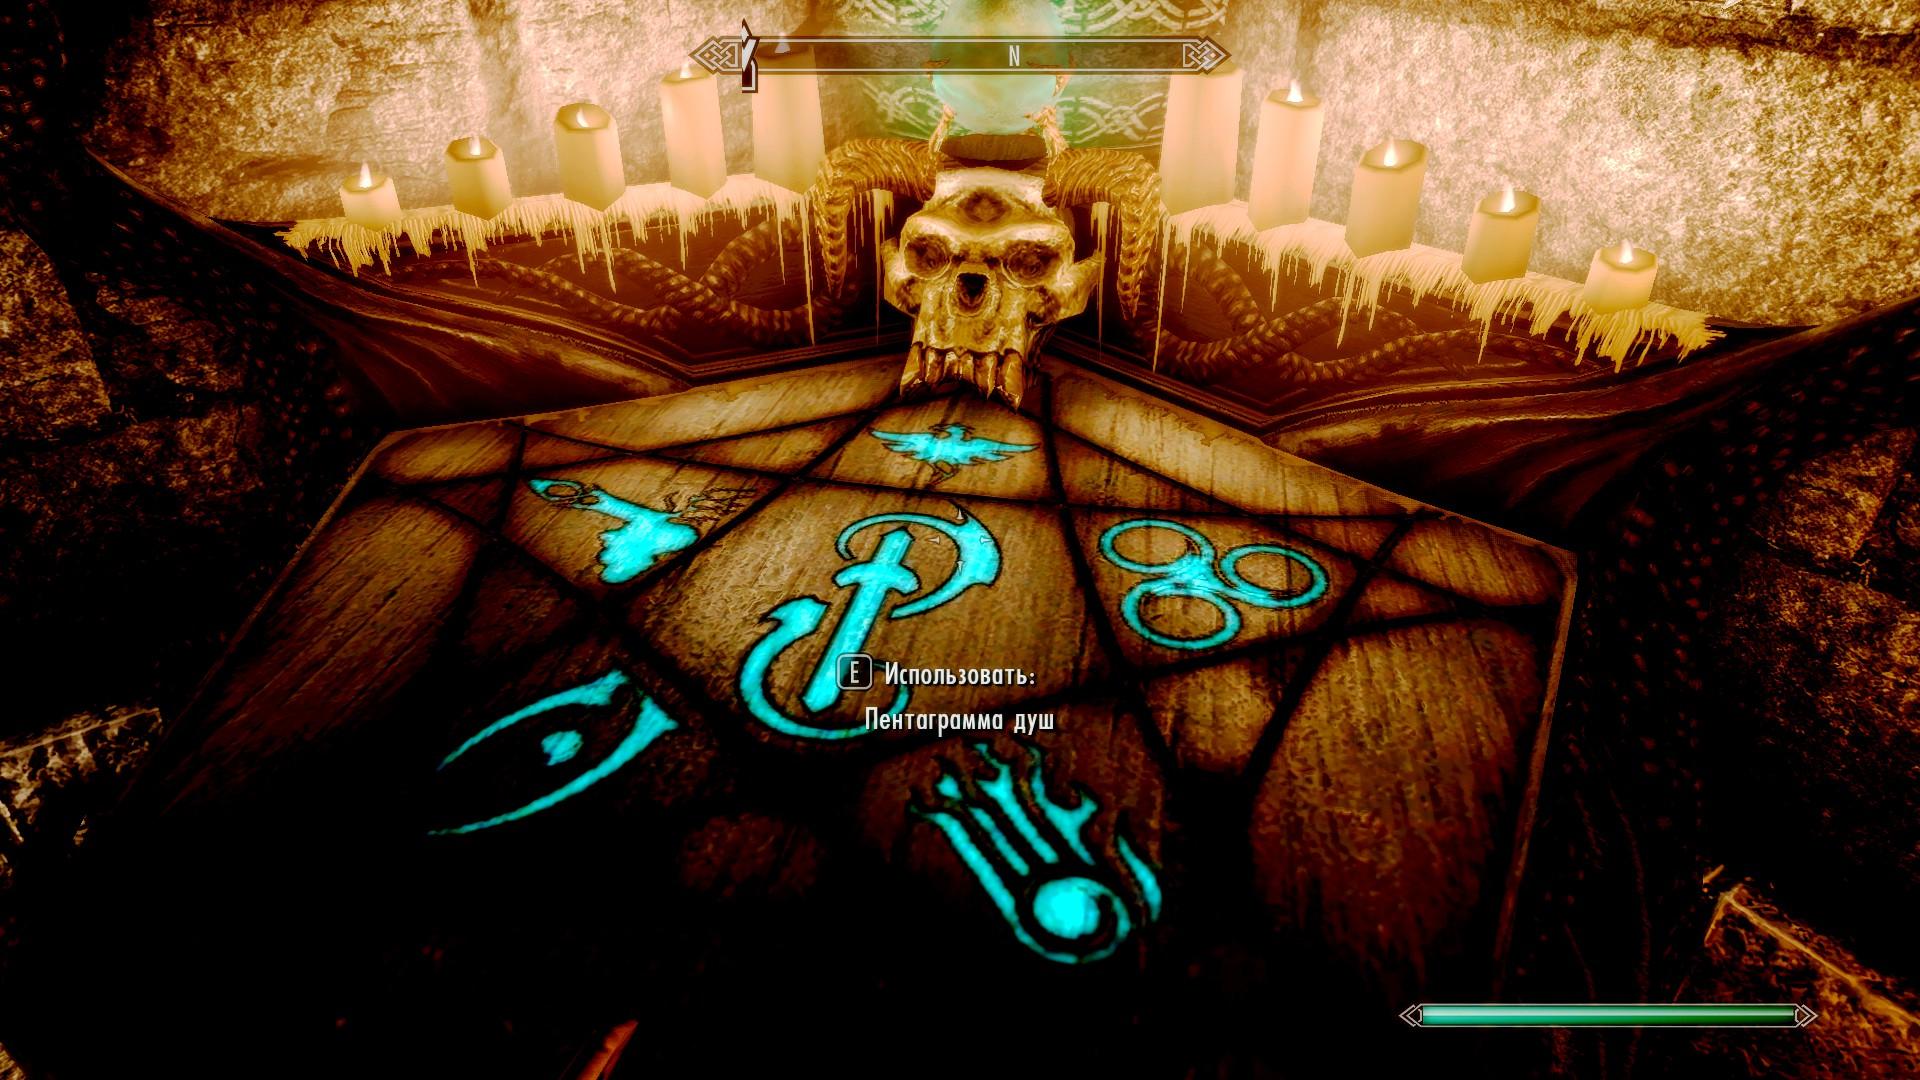 20171012162309_1.jpg - Elder Scrolls 5: Skyrim, the